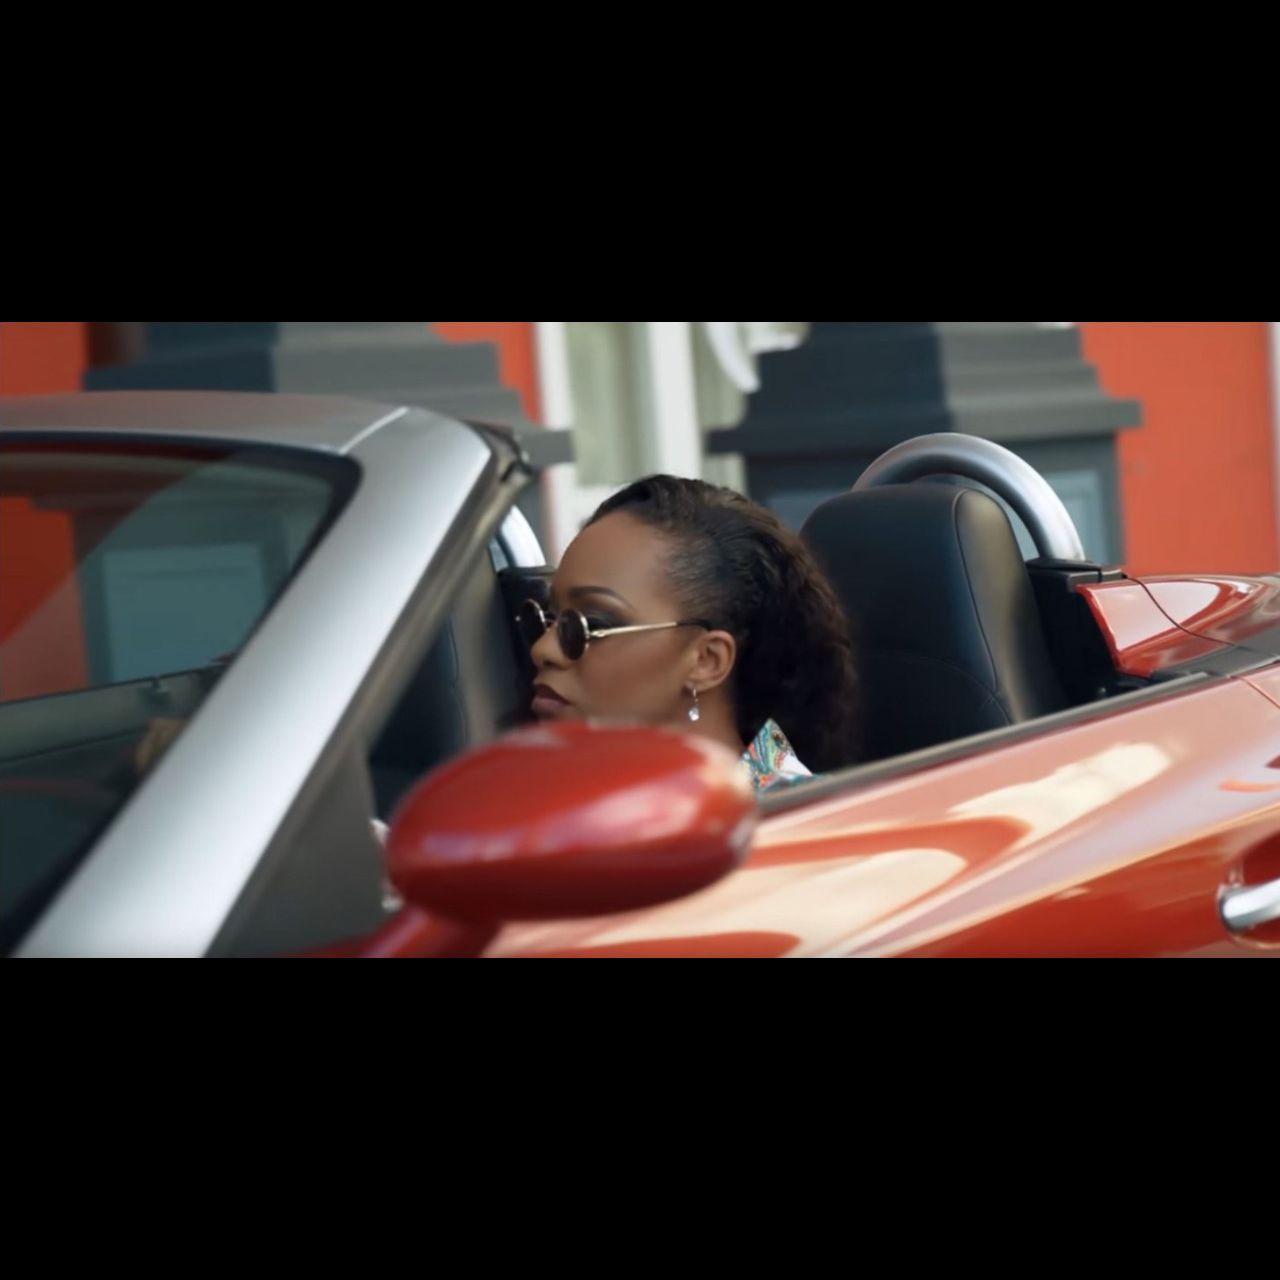 Jessye Belleval - Timid (ft. Nickenson Prud'homme) (Thumbnail)